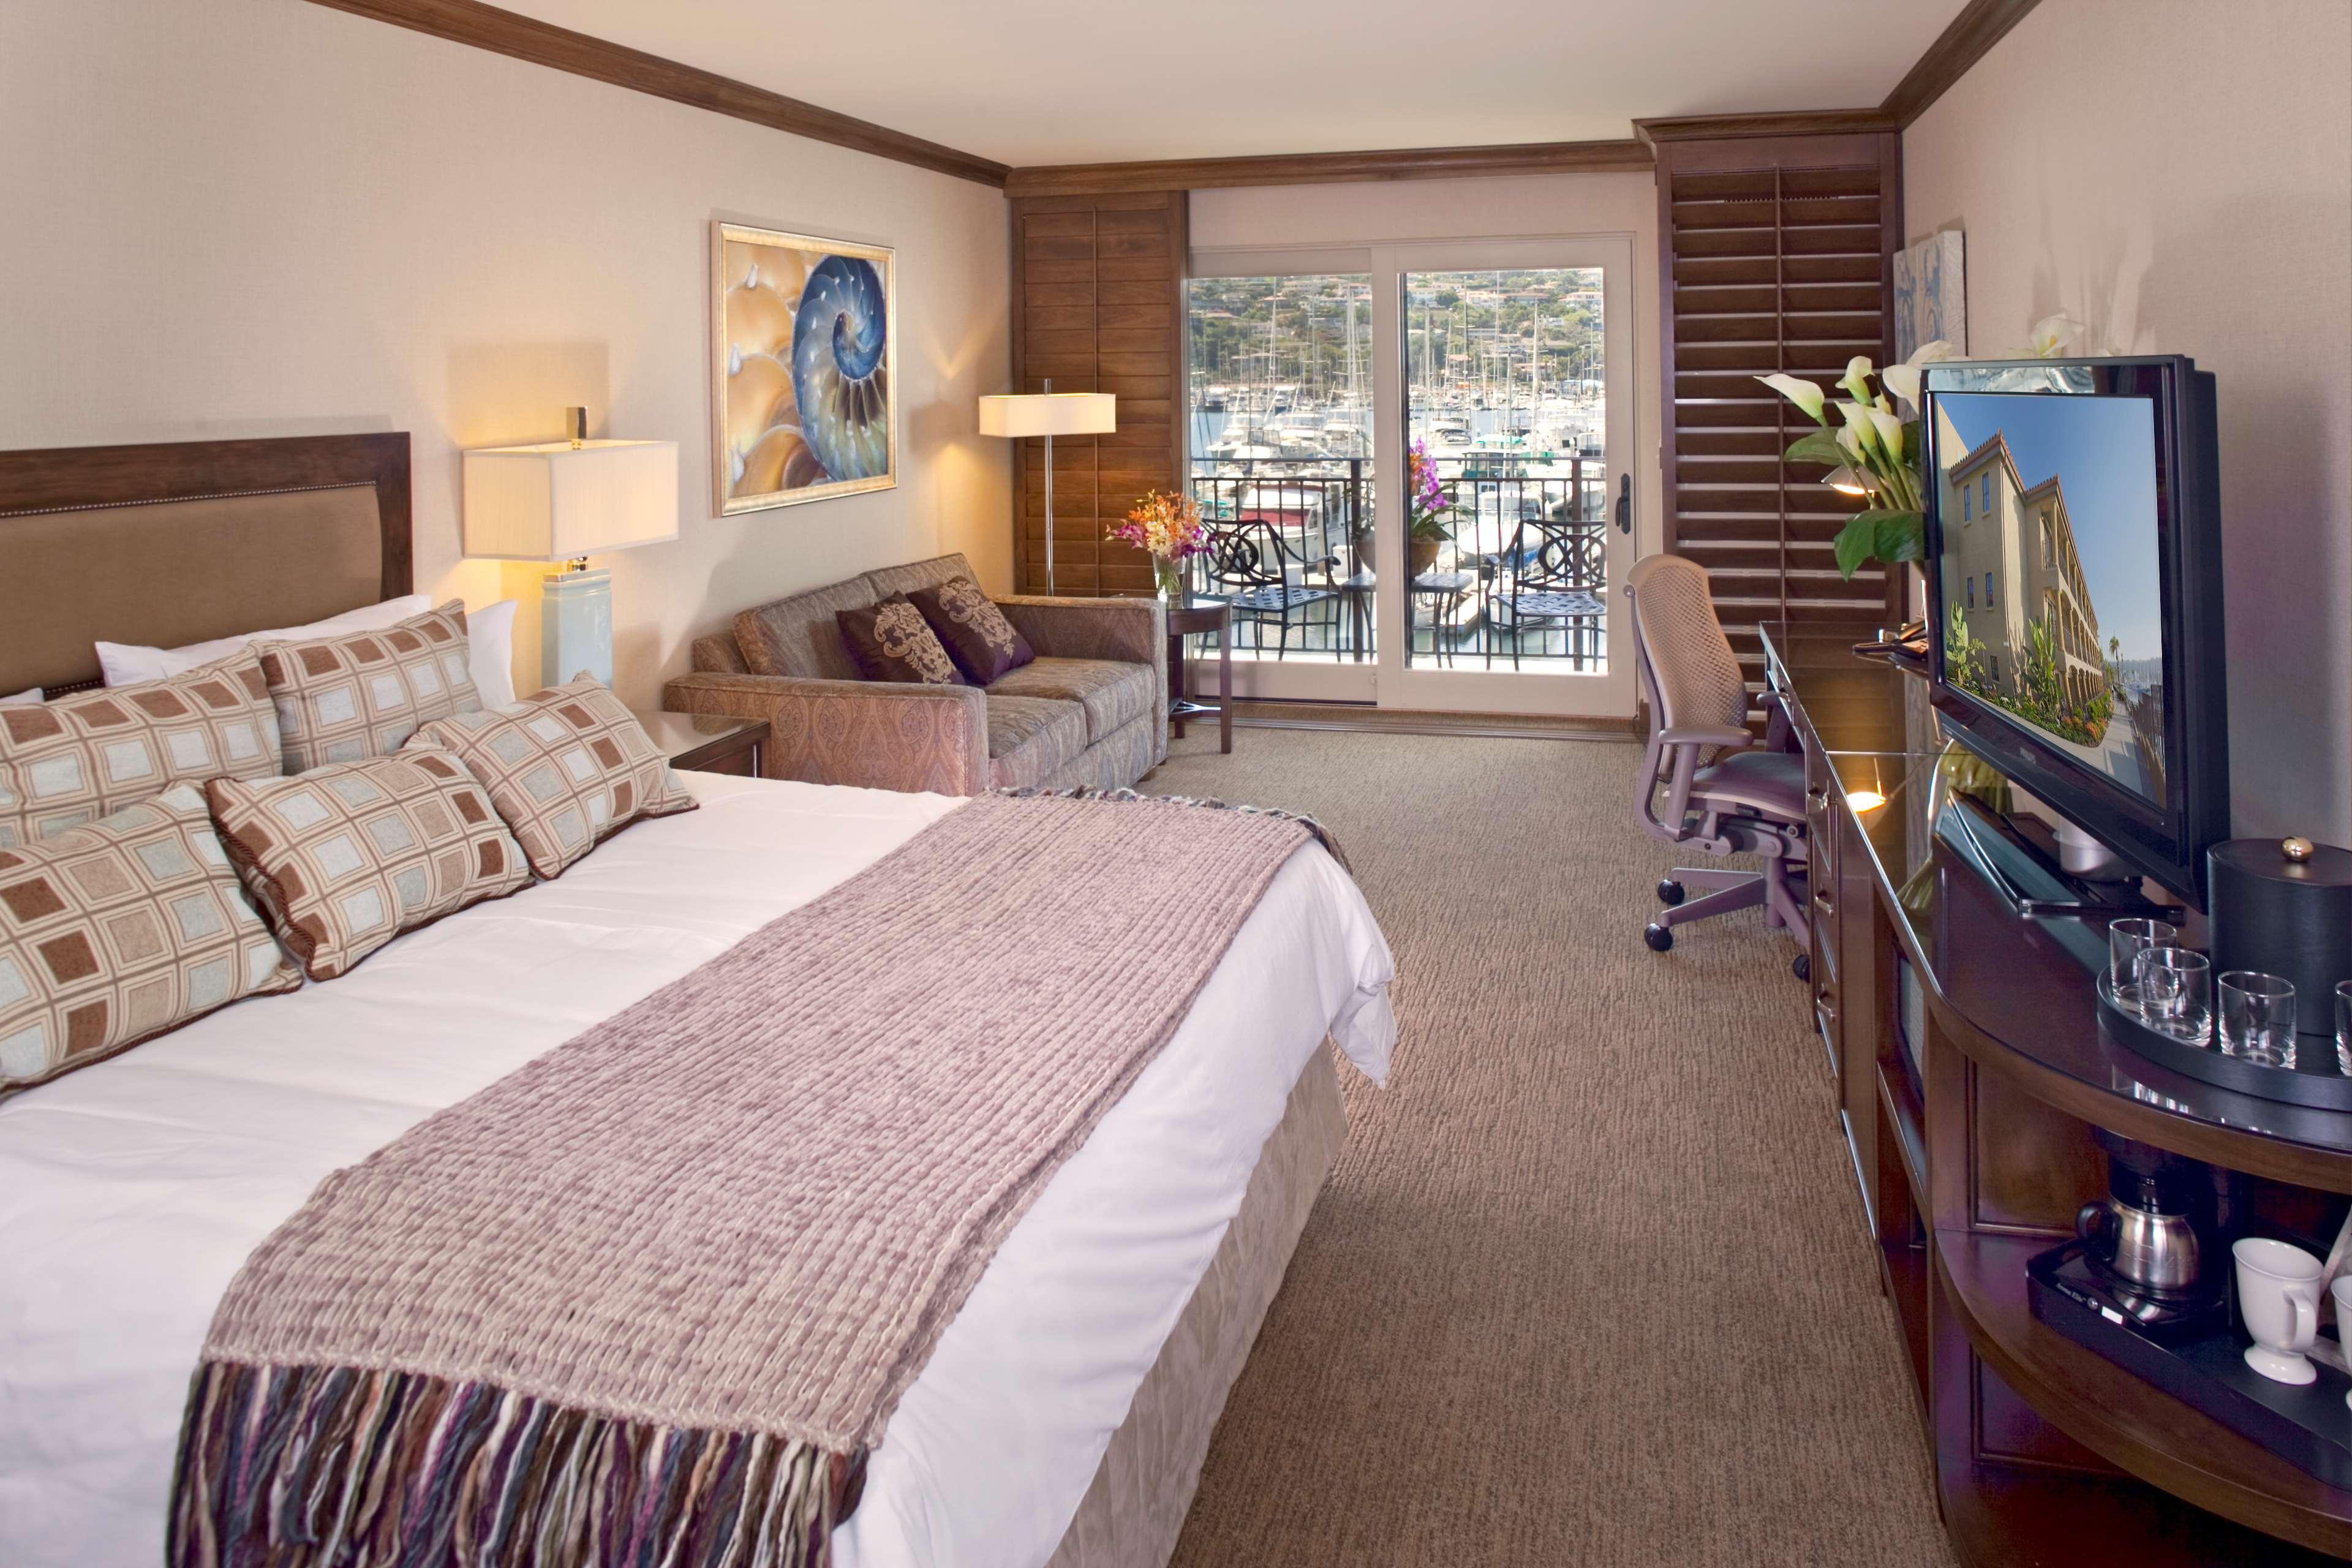 Best Western Plus Island Palms Hotel & Marina image 34